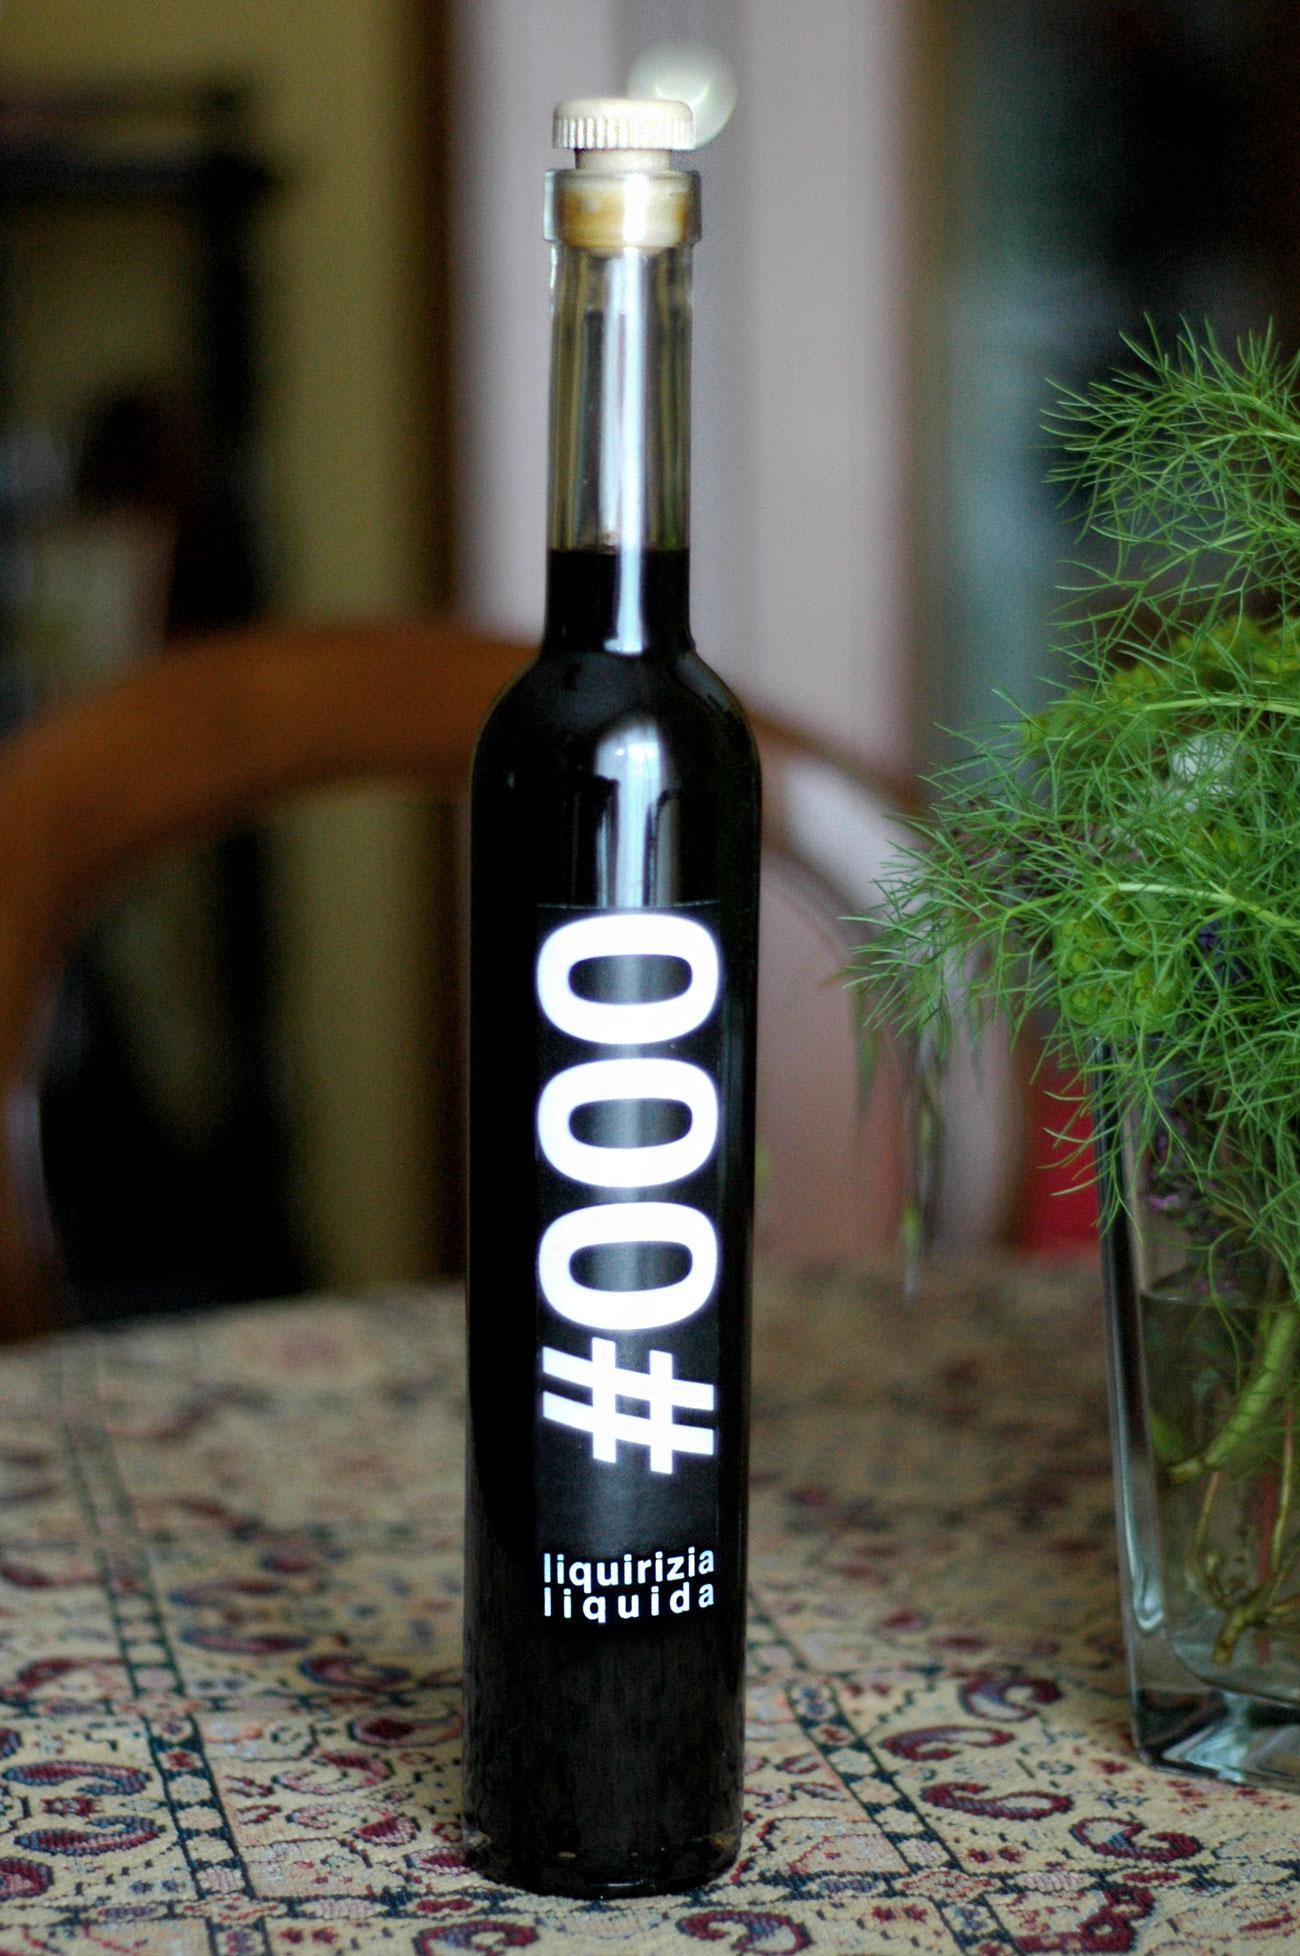 #000 liquore liquirizia